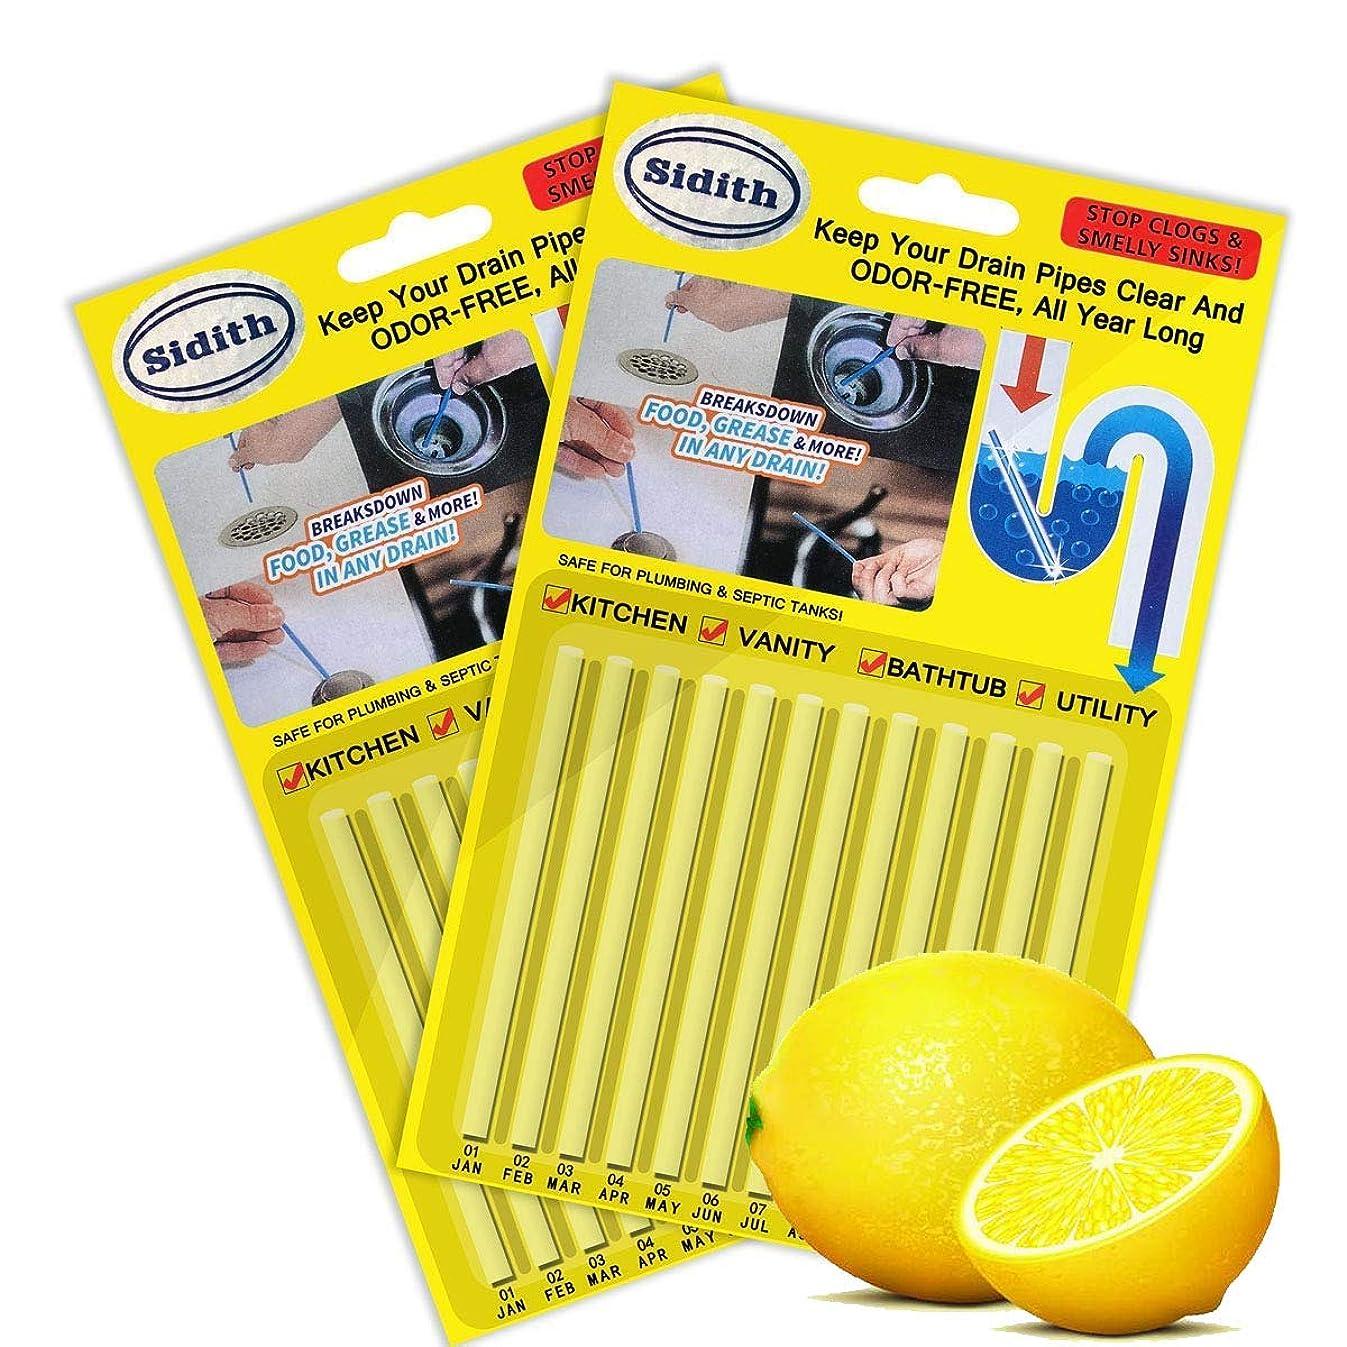 Sidith Drain Cleaner Sticks, Sink Deodorizer (24 Pcs), Sink Freshener to Keep Odor Free As Seen On TV for Bathroom, Kitchen, Toilet, Shower drain (Lemon)